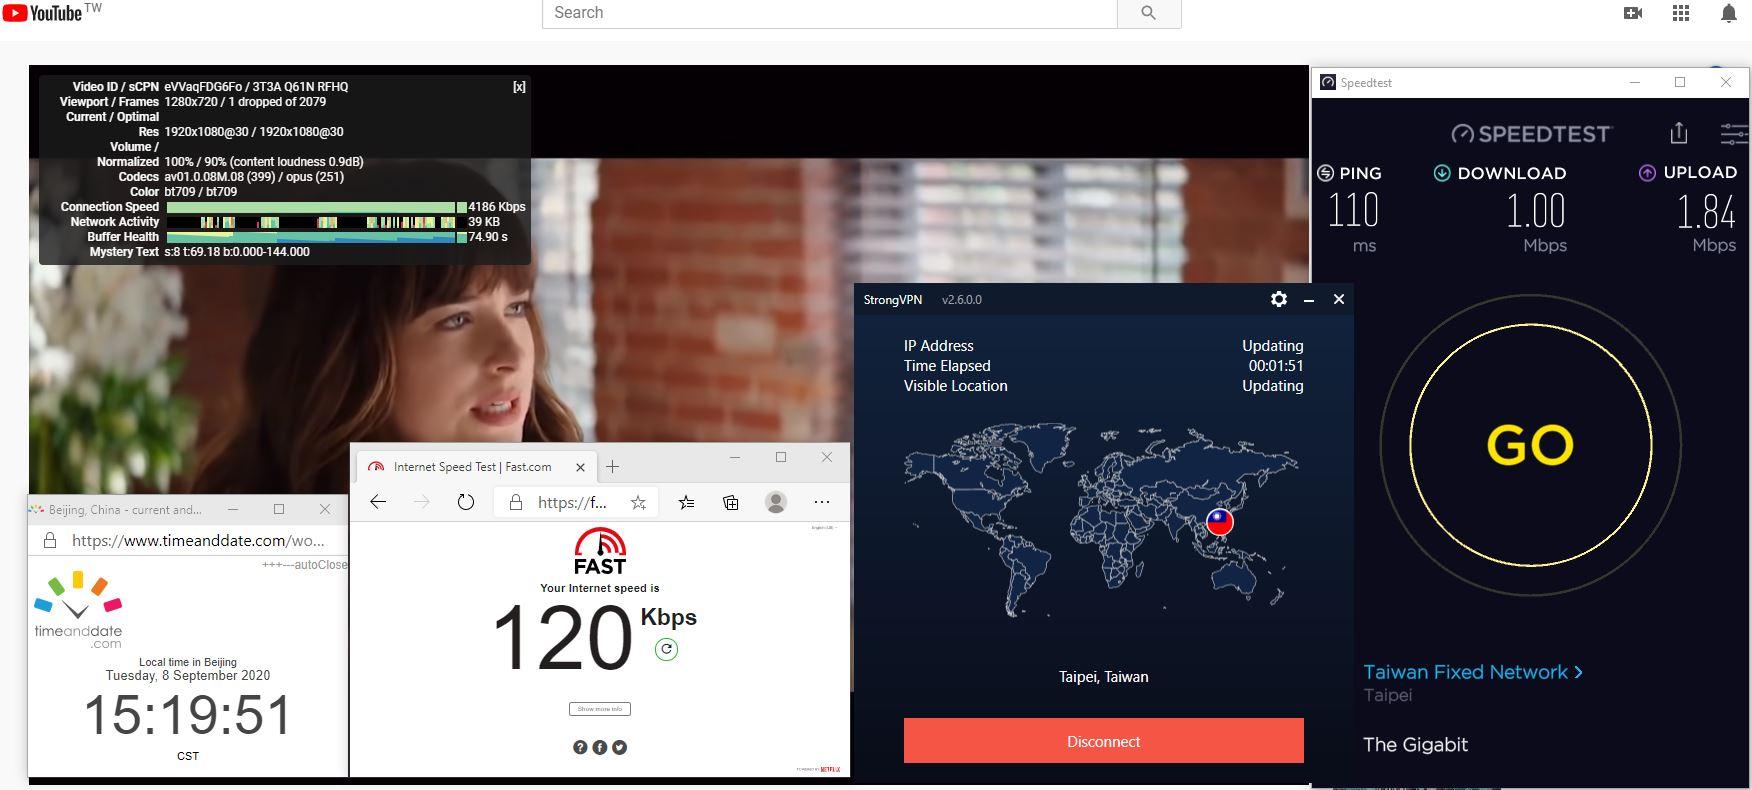 Windows10 StrongVPN Taiwan 中国VPN 翻墙 科学上网 翻墙速度测试 - 20200908